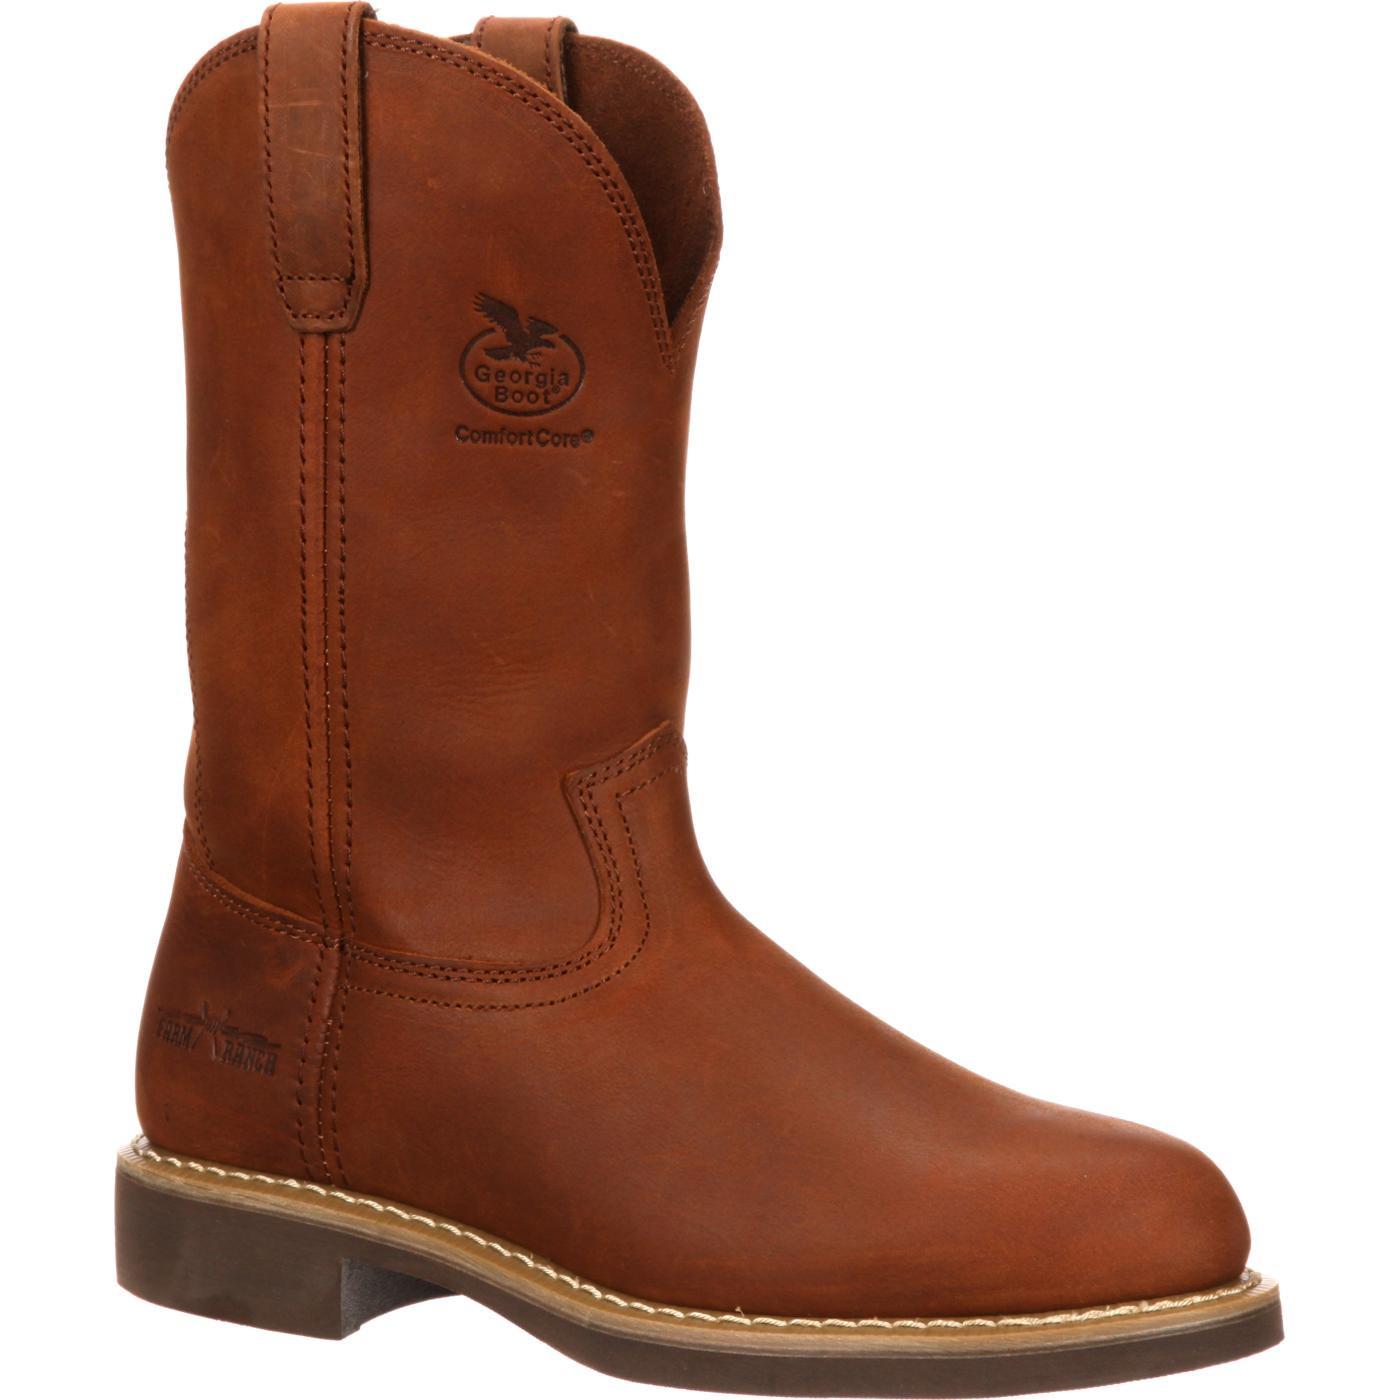 wellington boots georgia boot carbo-tec wellington, , large tfnvaoy